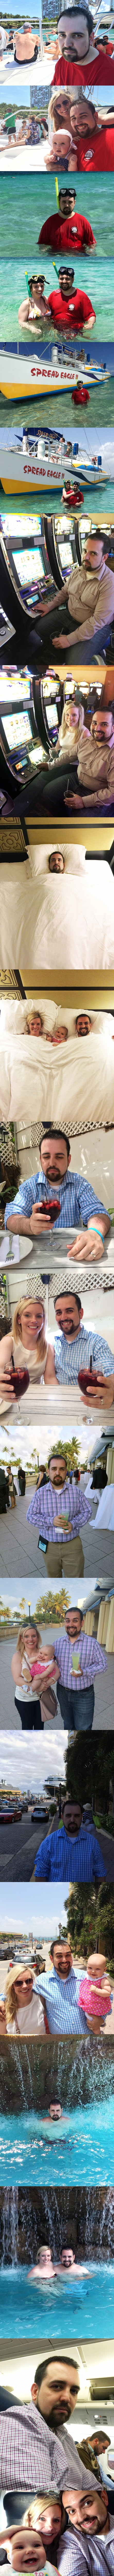 "&quot;Чувак, который выиграл поездку Пуэрто Рико, всё таки ездил с женой и отлично провел там время&quot; В ответ на пост / <a href=""http://pikabu.ru/story/vyiigral_poezdku_v_puyerto_riko_no_zhena_k_sozhaleniyu_ne_smogla_poekhat_vot_kak_ya_provel_vremya_3215535"">http://pikabu.ru/story/_3215535</a>"